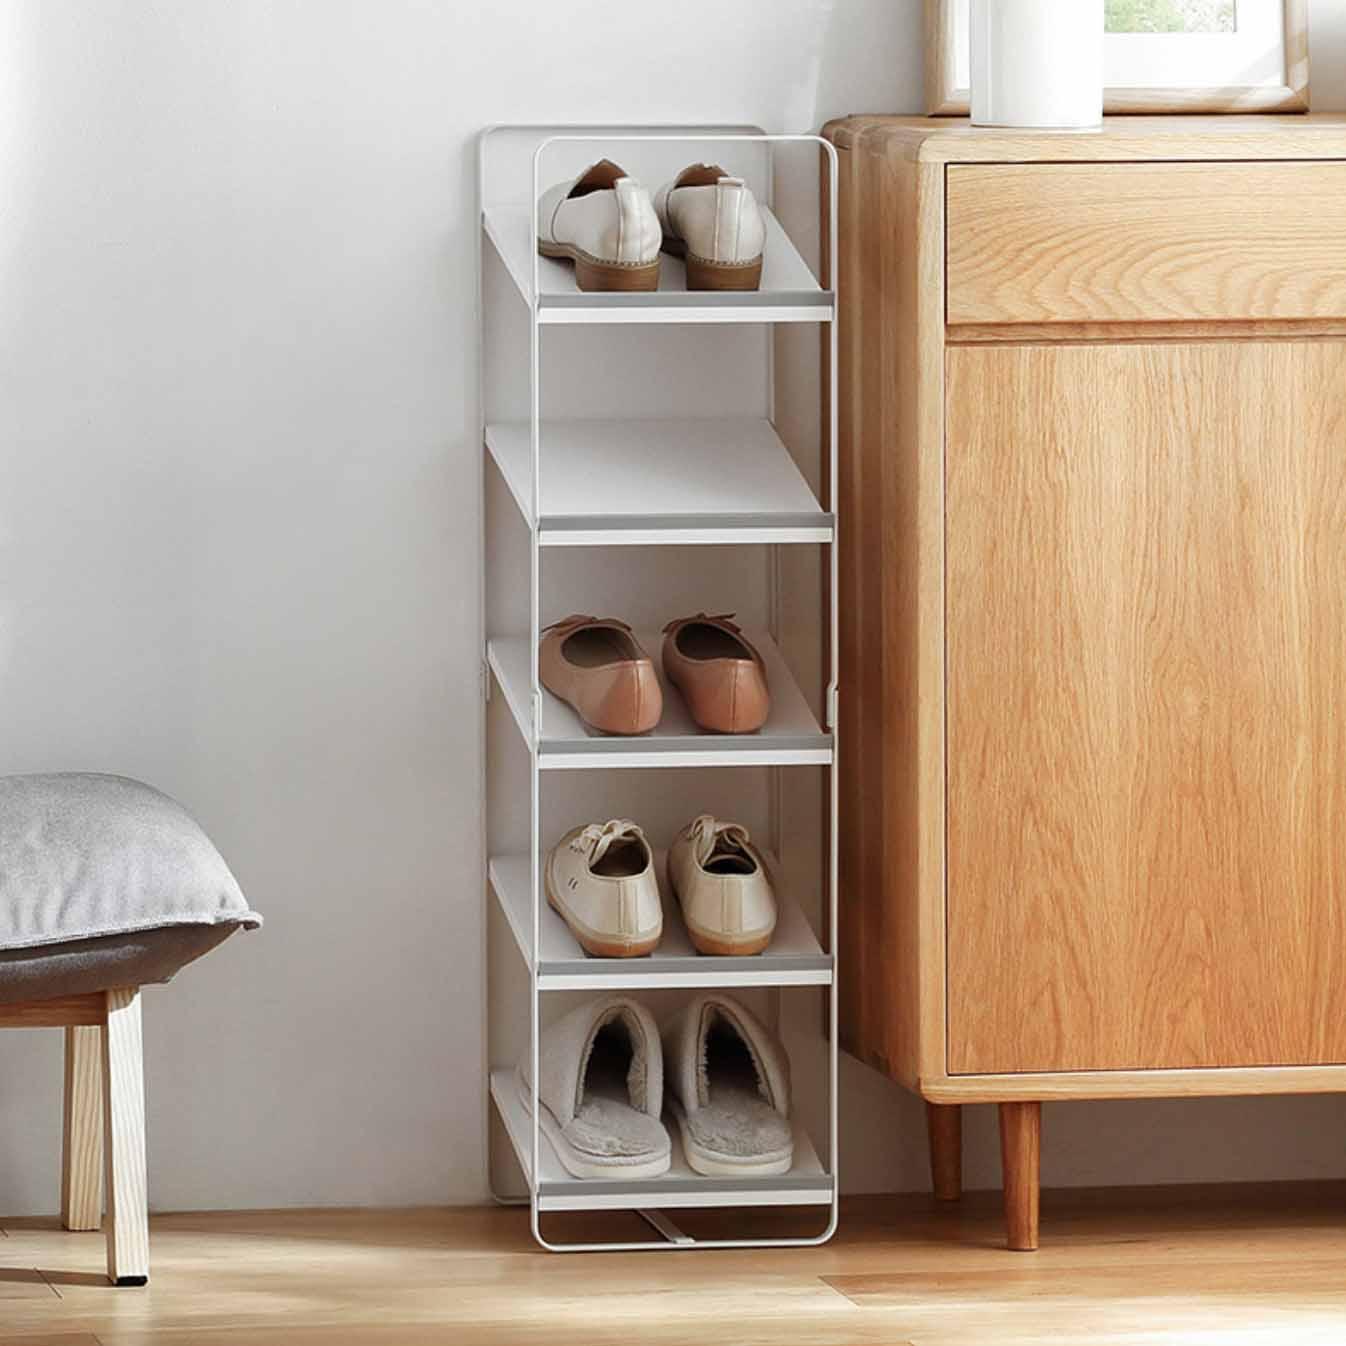 Kitchen Shelf Rack Singapore: Ascend Shoe Rack (Slim Design)